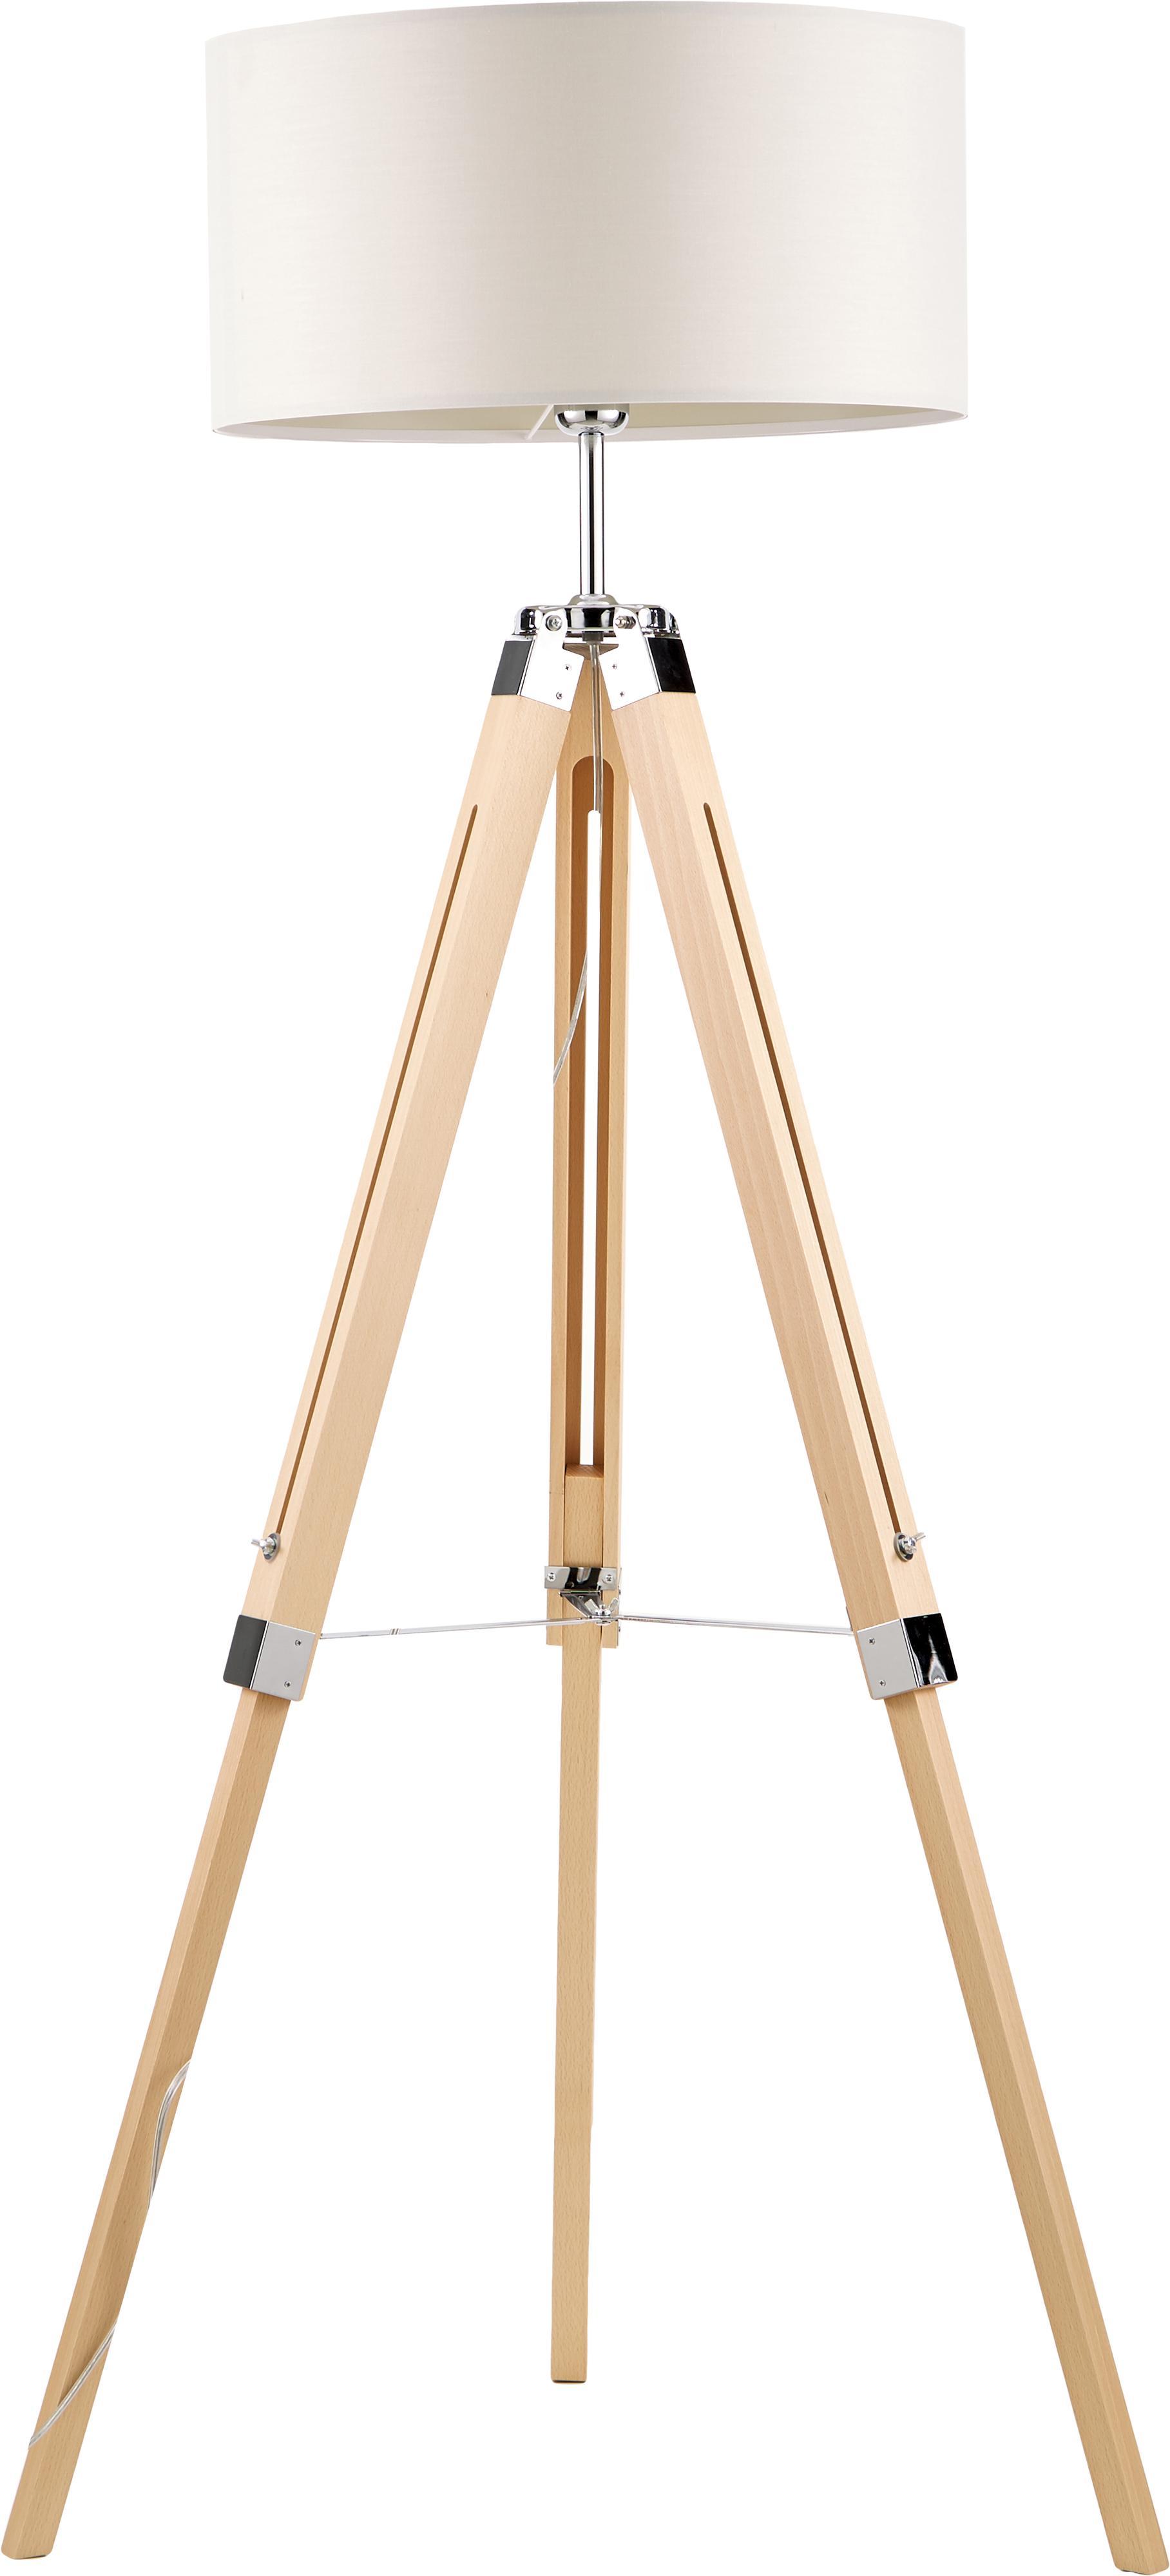 Tripod Stehlampe Josey aus Holz, Lampenschirm: Textil, Creme, Braun, Ø 70 x H 150 cm